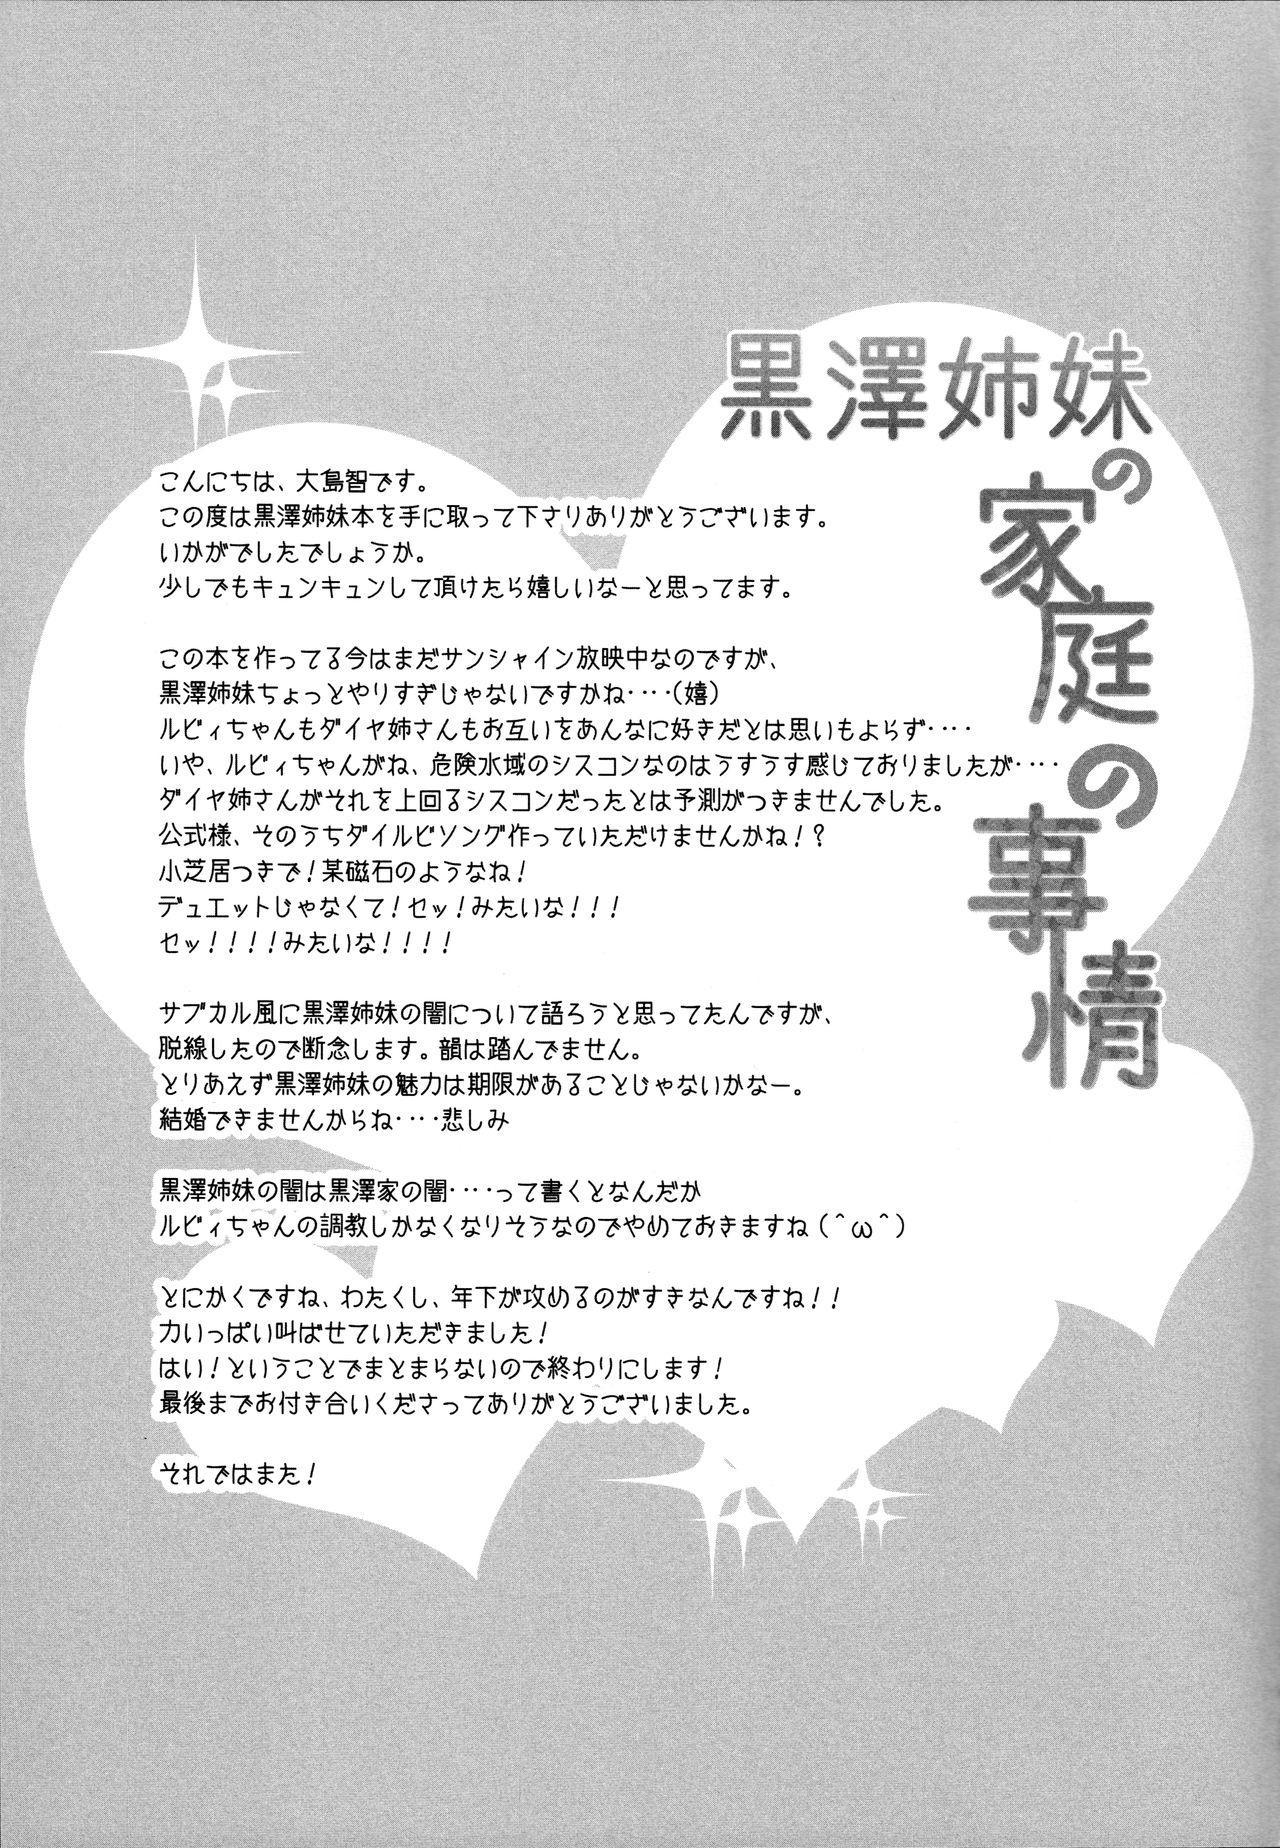 Kurosawa Shimai no Katei no Jijou | State of Affairs in The Kurosawa Sister's Family Home 28